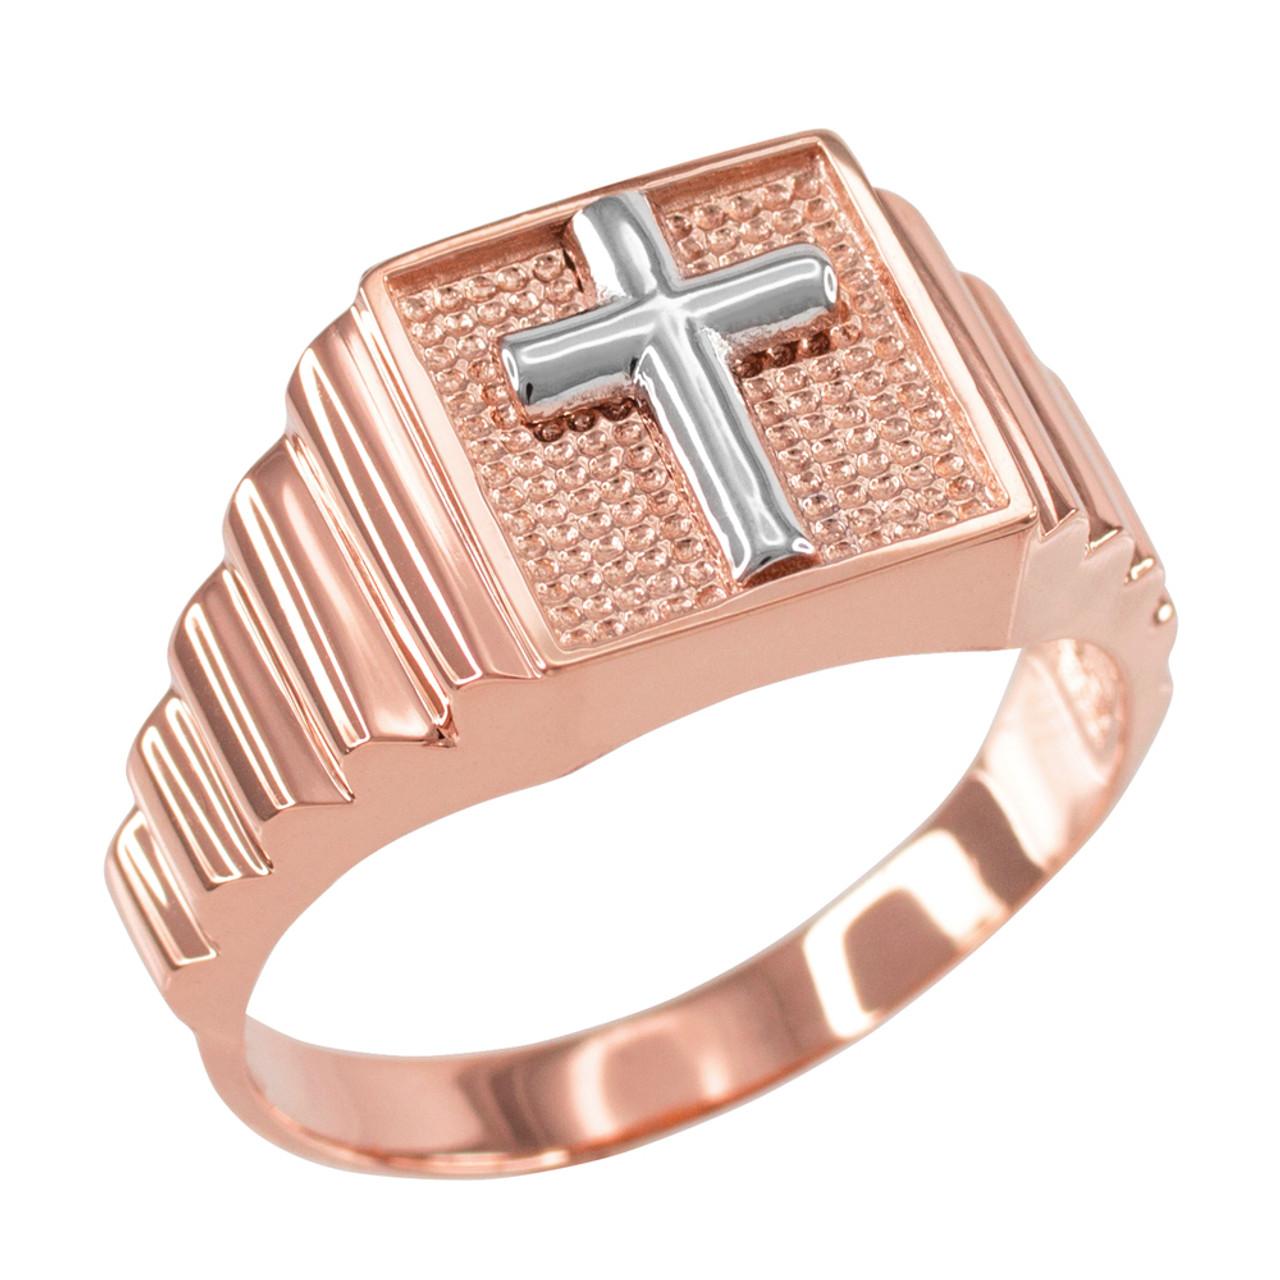 rose gold christian cross square mens ring. Black Bedroom Furniture Sets. Home Design Ideas